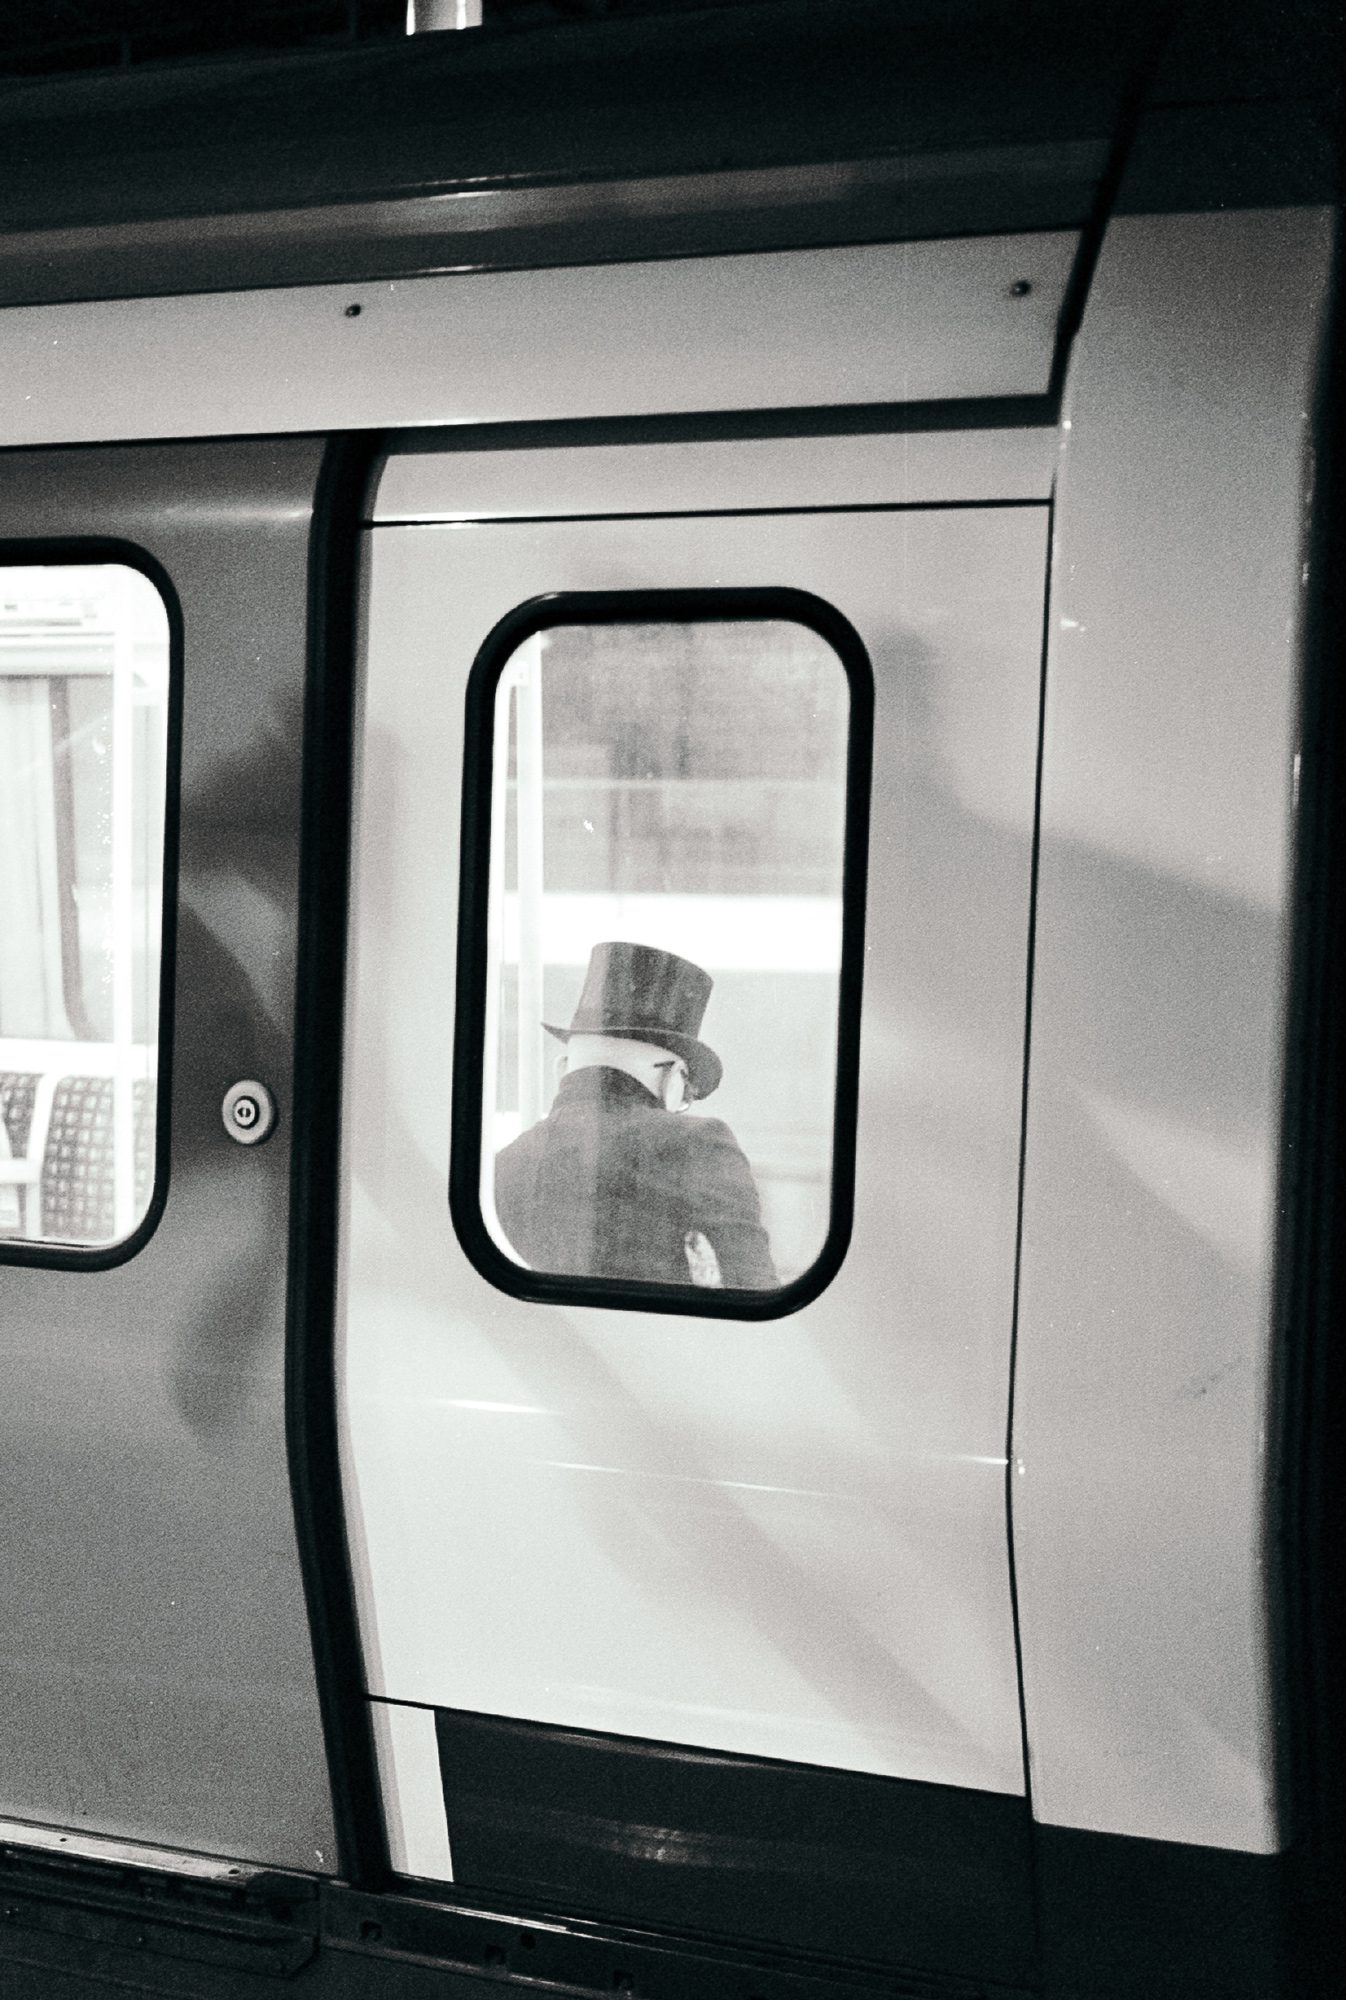 Black and white negative shot on ILFORD XP2 Super film by Simon King